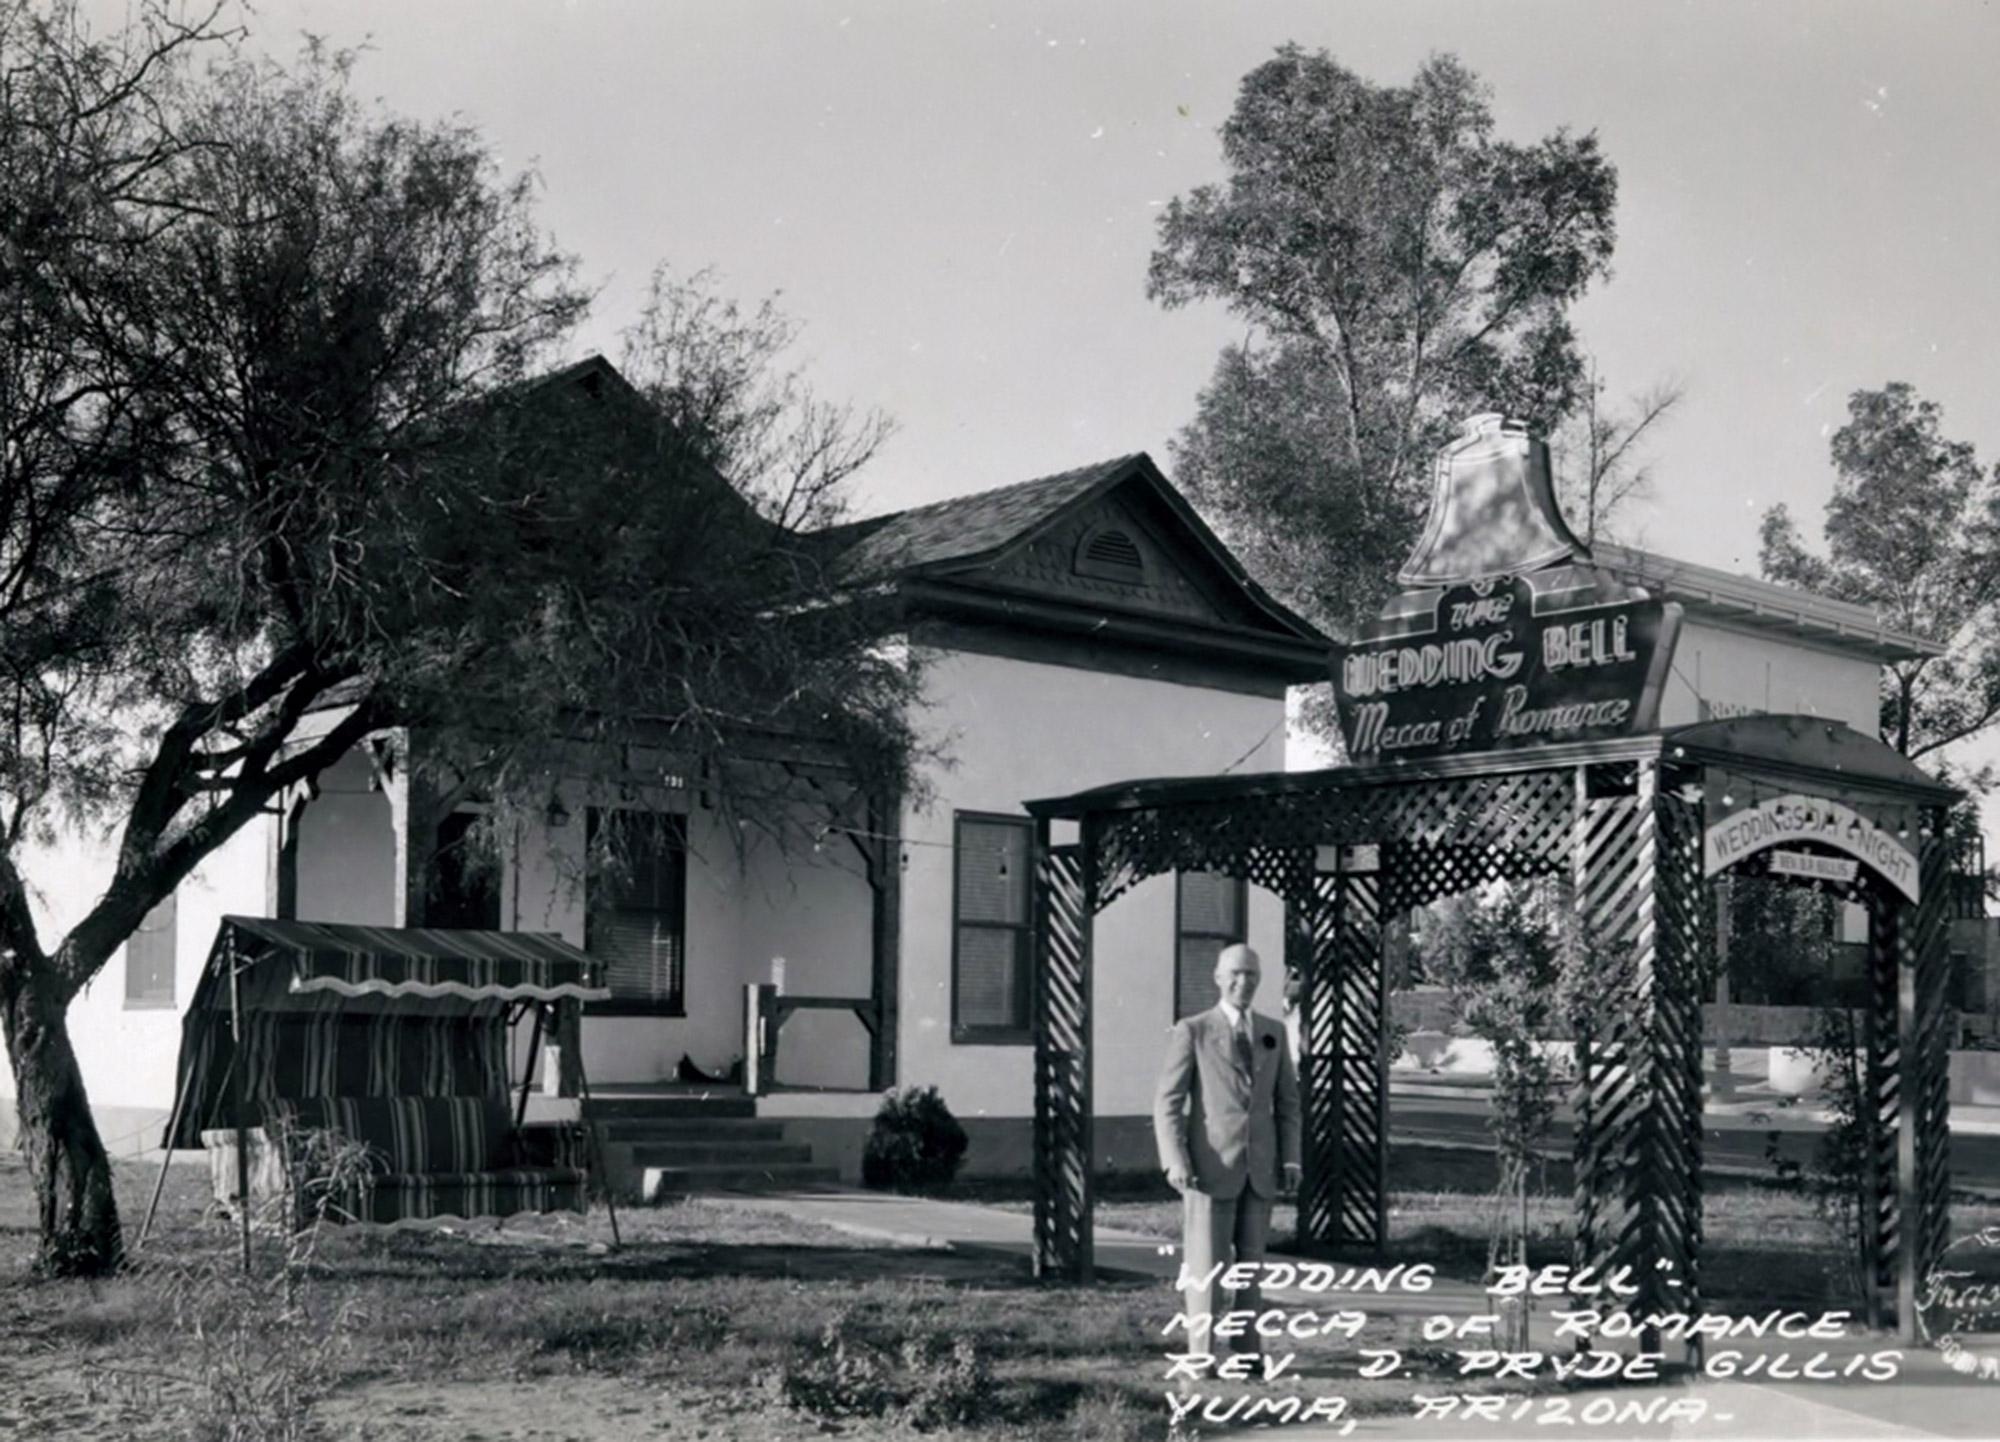 Wedding Bell Chapel, 1930s; Photo courtesy Popular Aviation Magazine